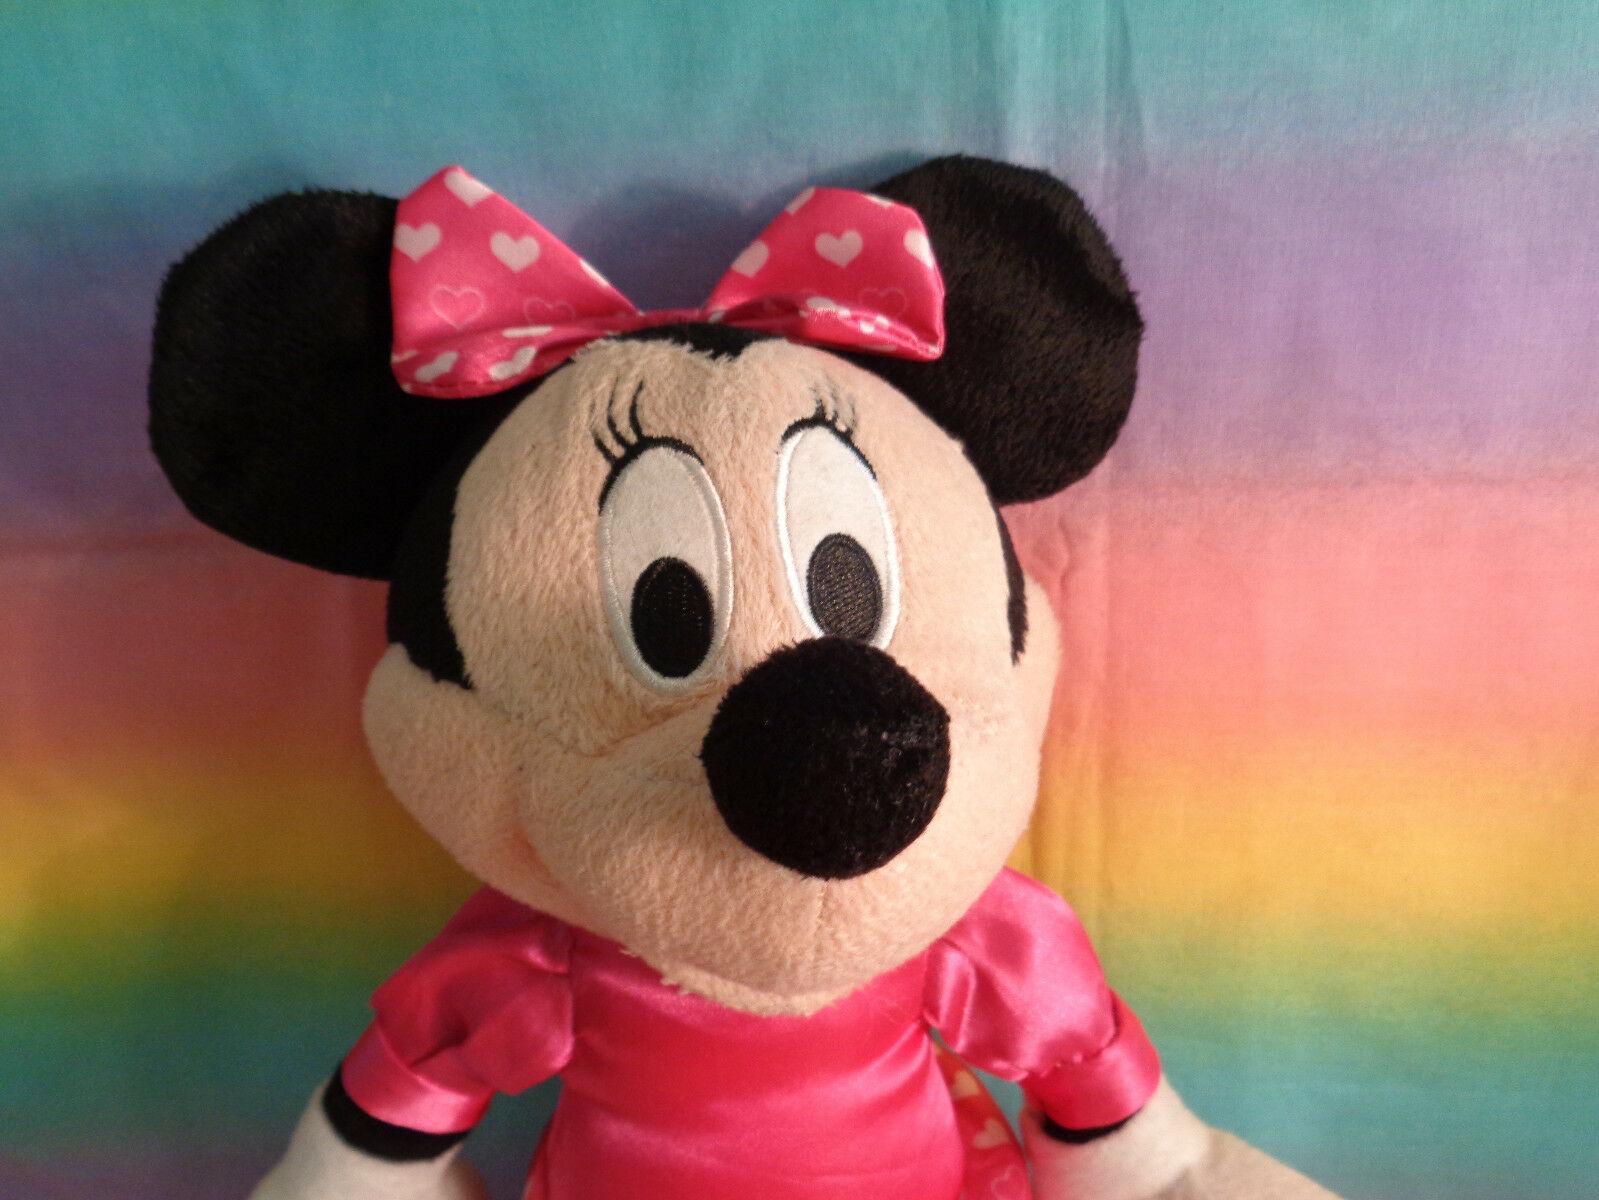 "Disney Kcare Kiu Hung Industries Minnie Mouse Pink Dress Plush Doll 13"" image 3"